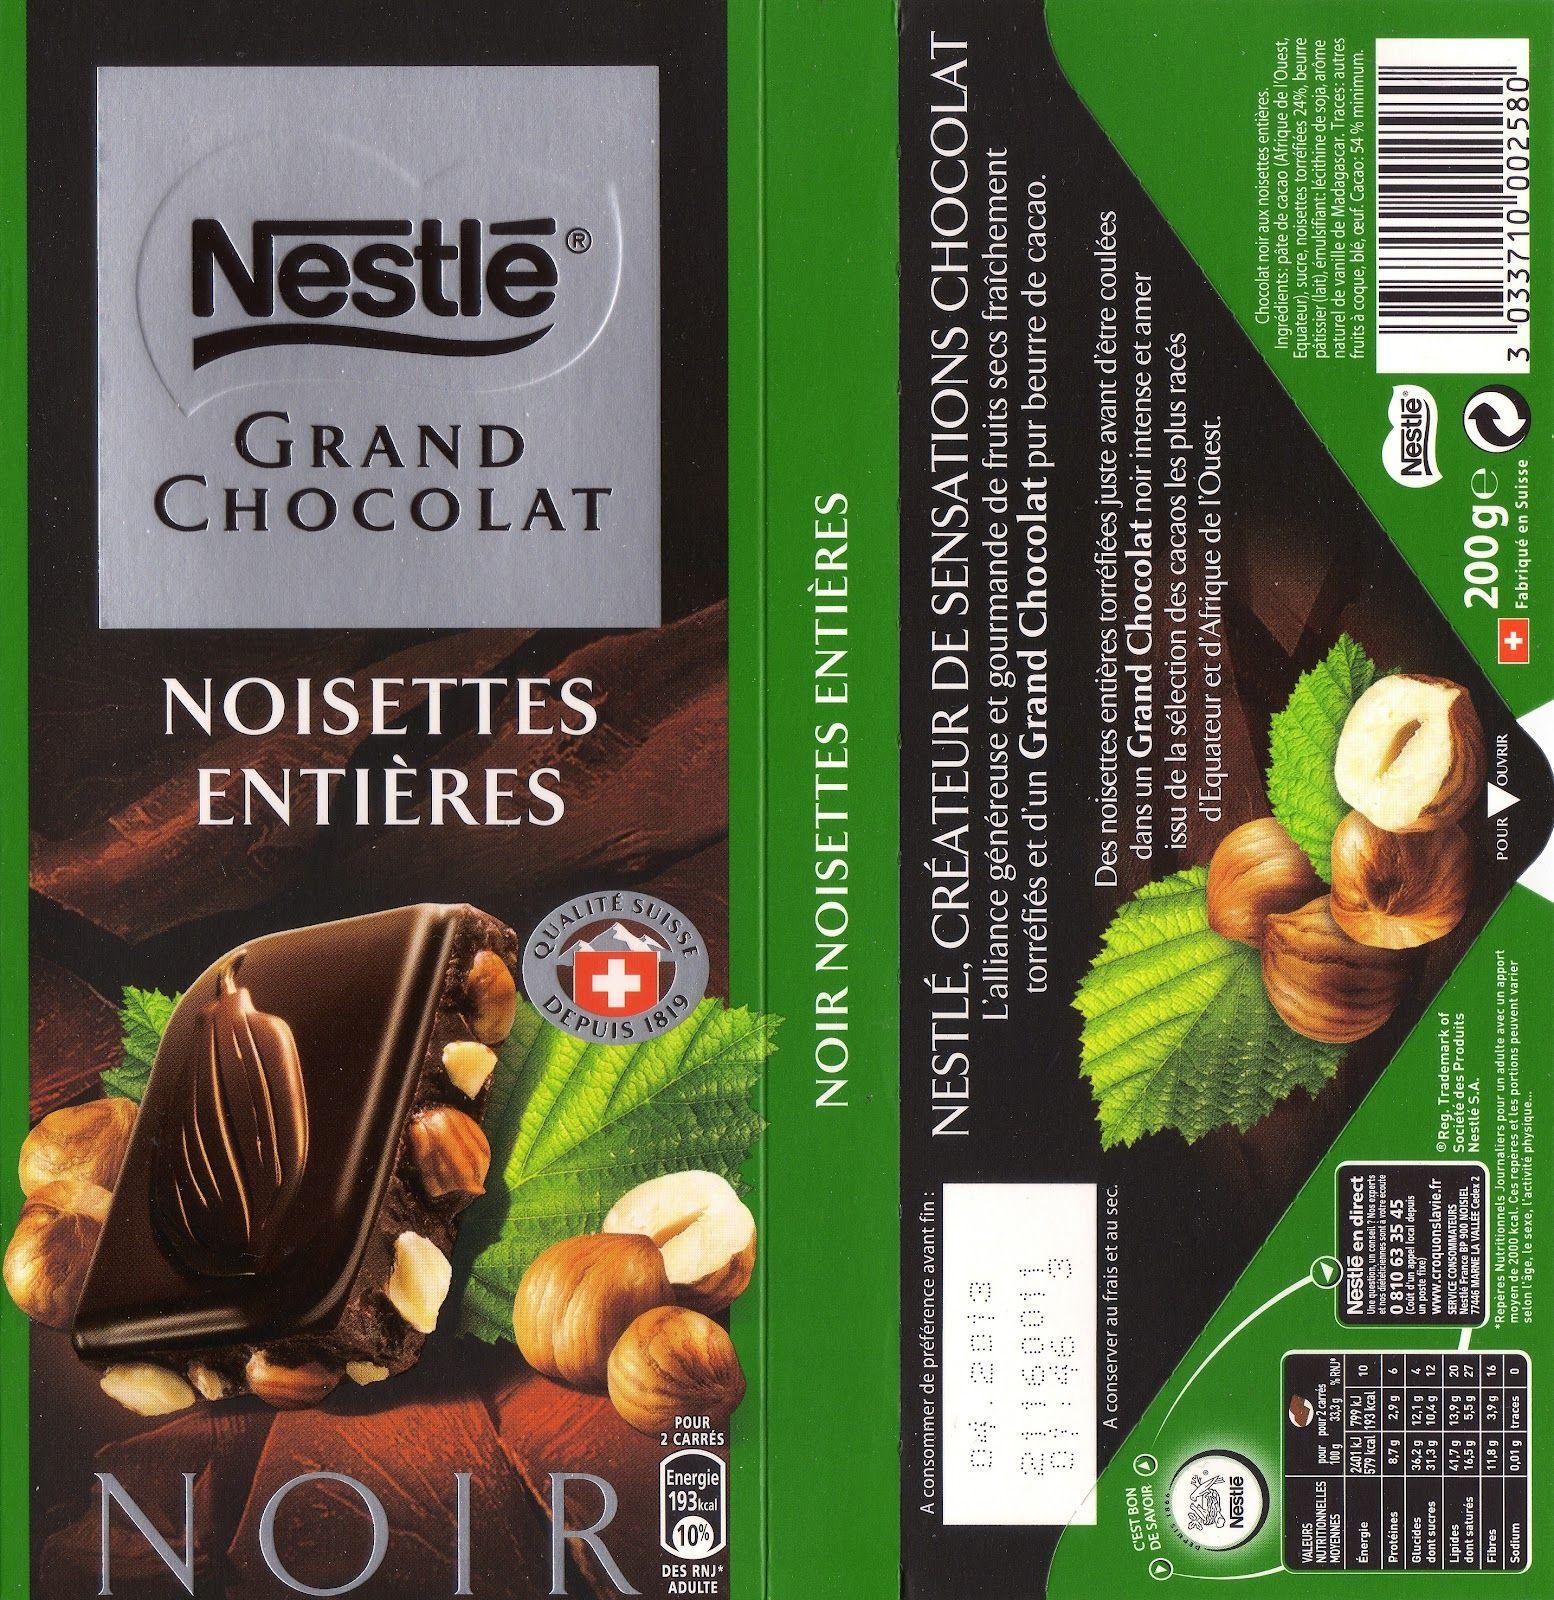 nestle grand chocolat noir noisettes